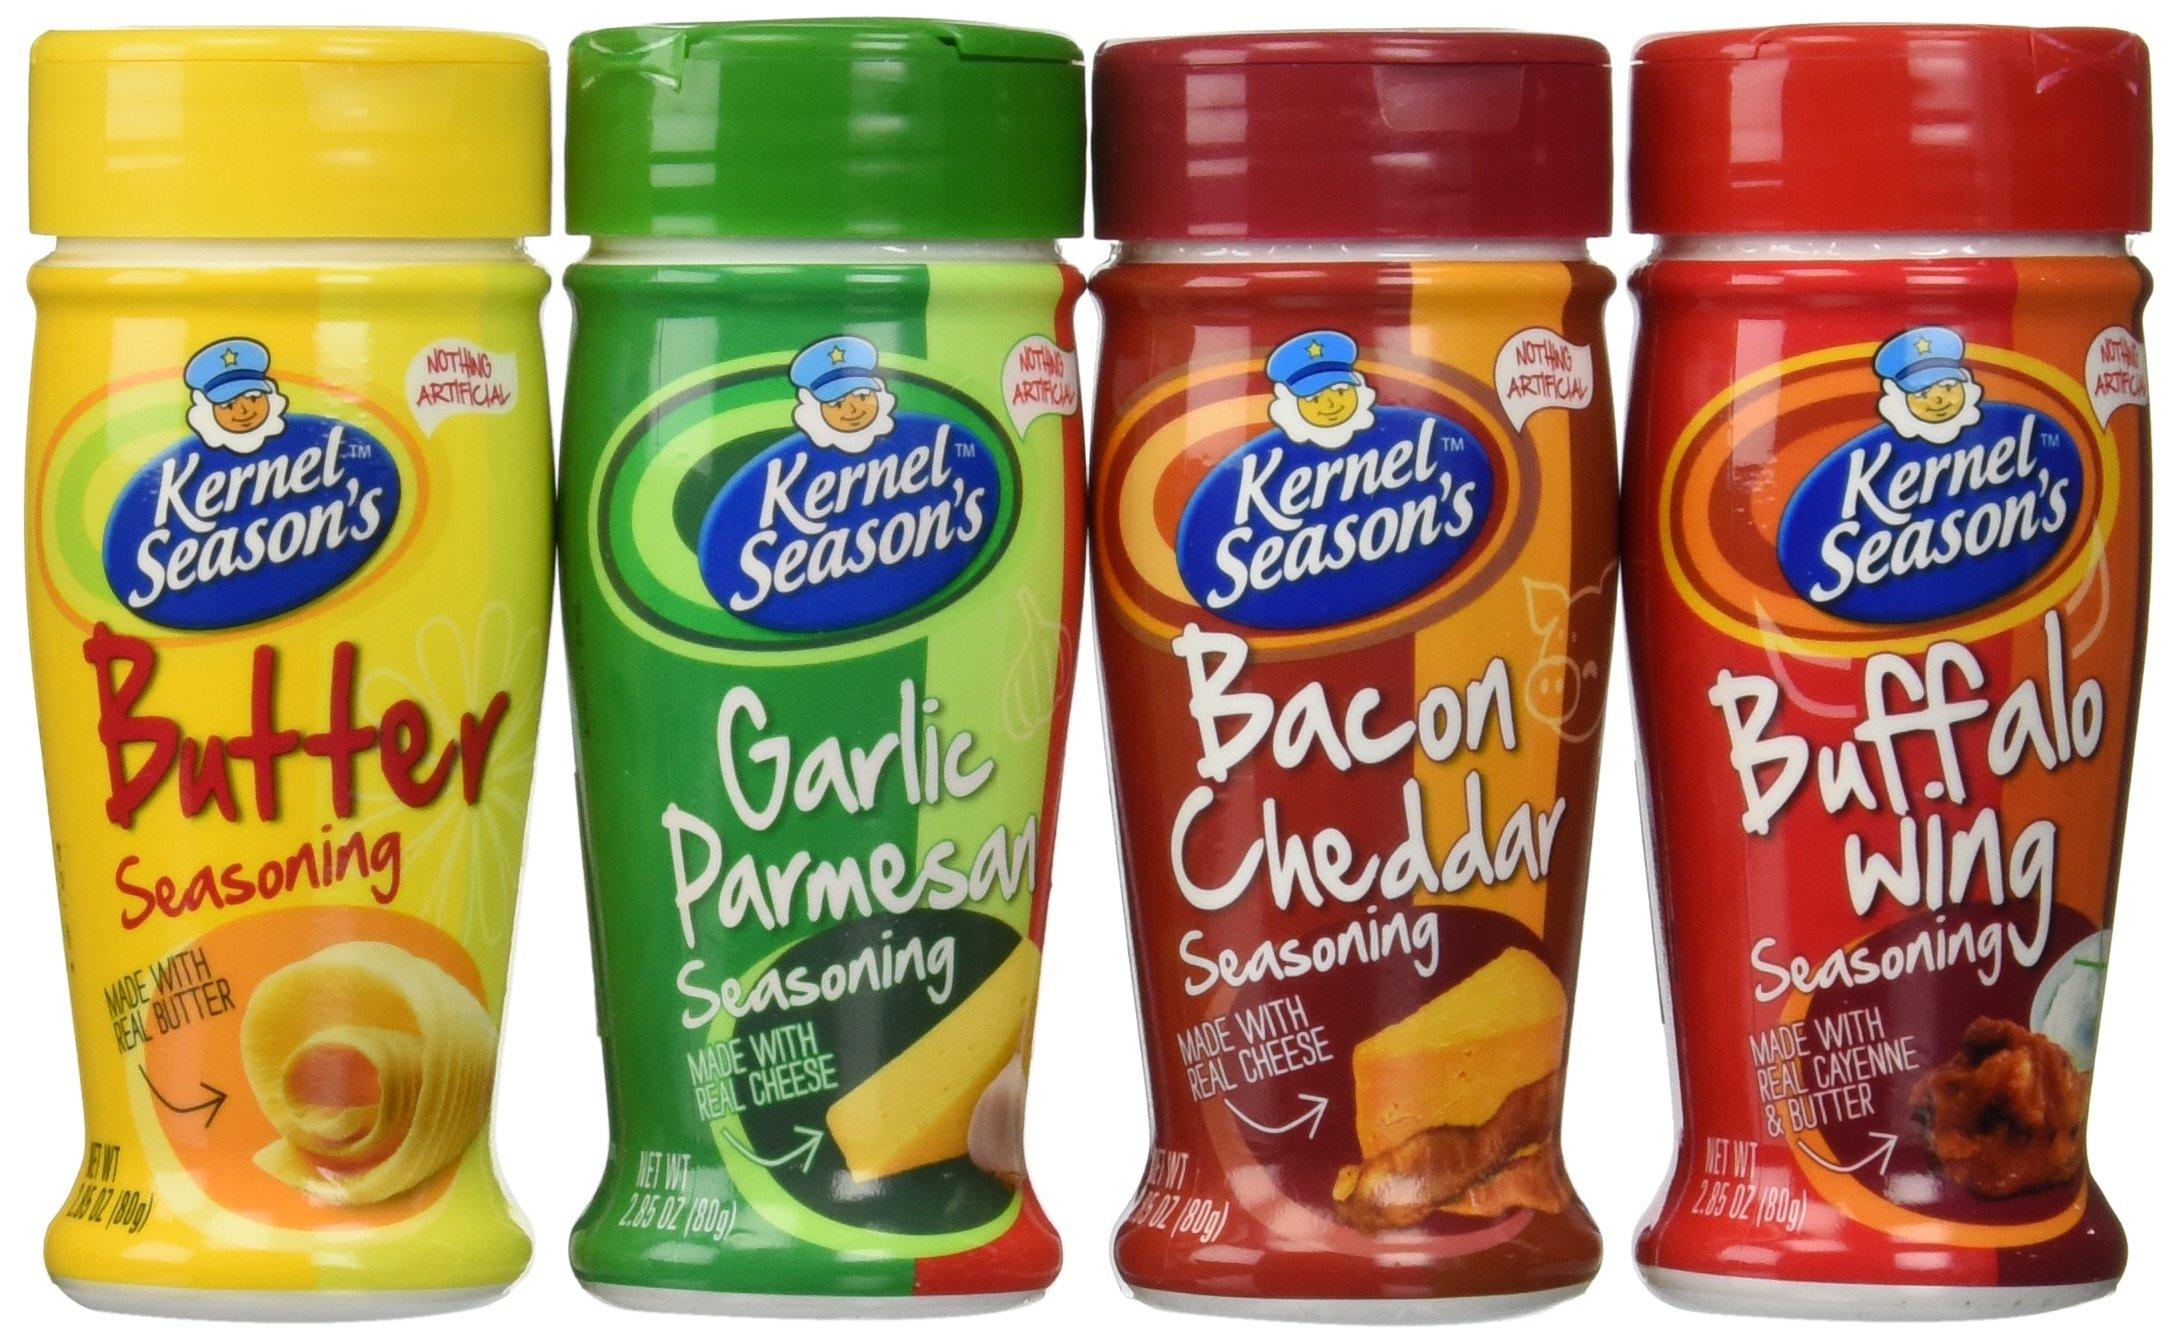 Kernal Season's Popcorn Seasoning 4 Flavor Variety Bundle: (1) Kernal Season's Butter Popcorn Seasoning, (1) Kernal Season's Garlic Parmesan Popcorn Seasoning, (1) Kernal Season's Buffalo Wing Popcorn Seasoning, and (1) Kernal Season's Bacon Cheddar Popco